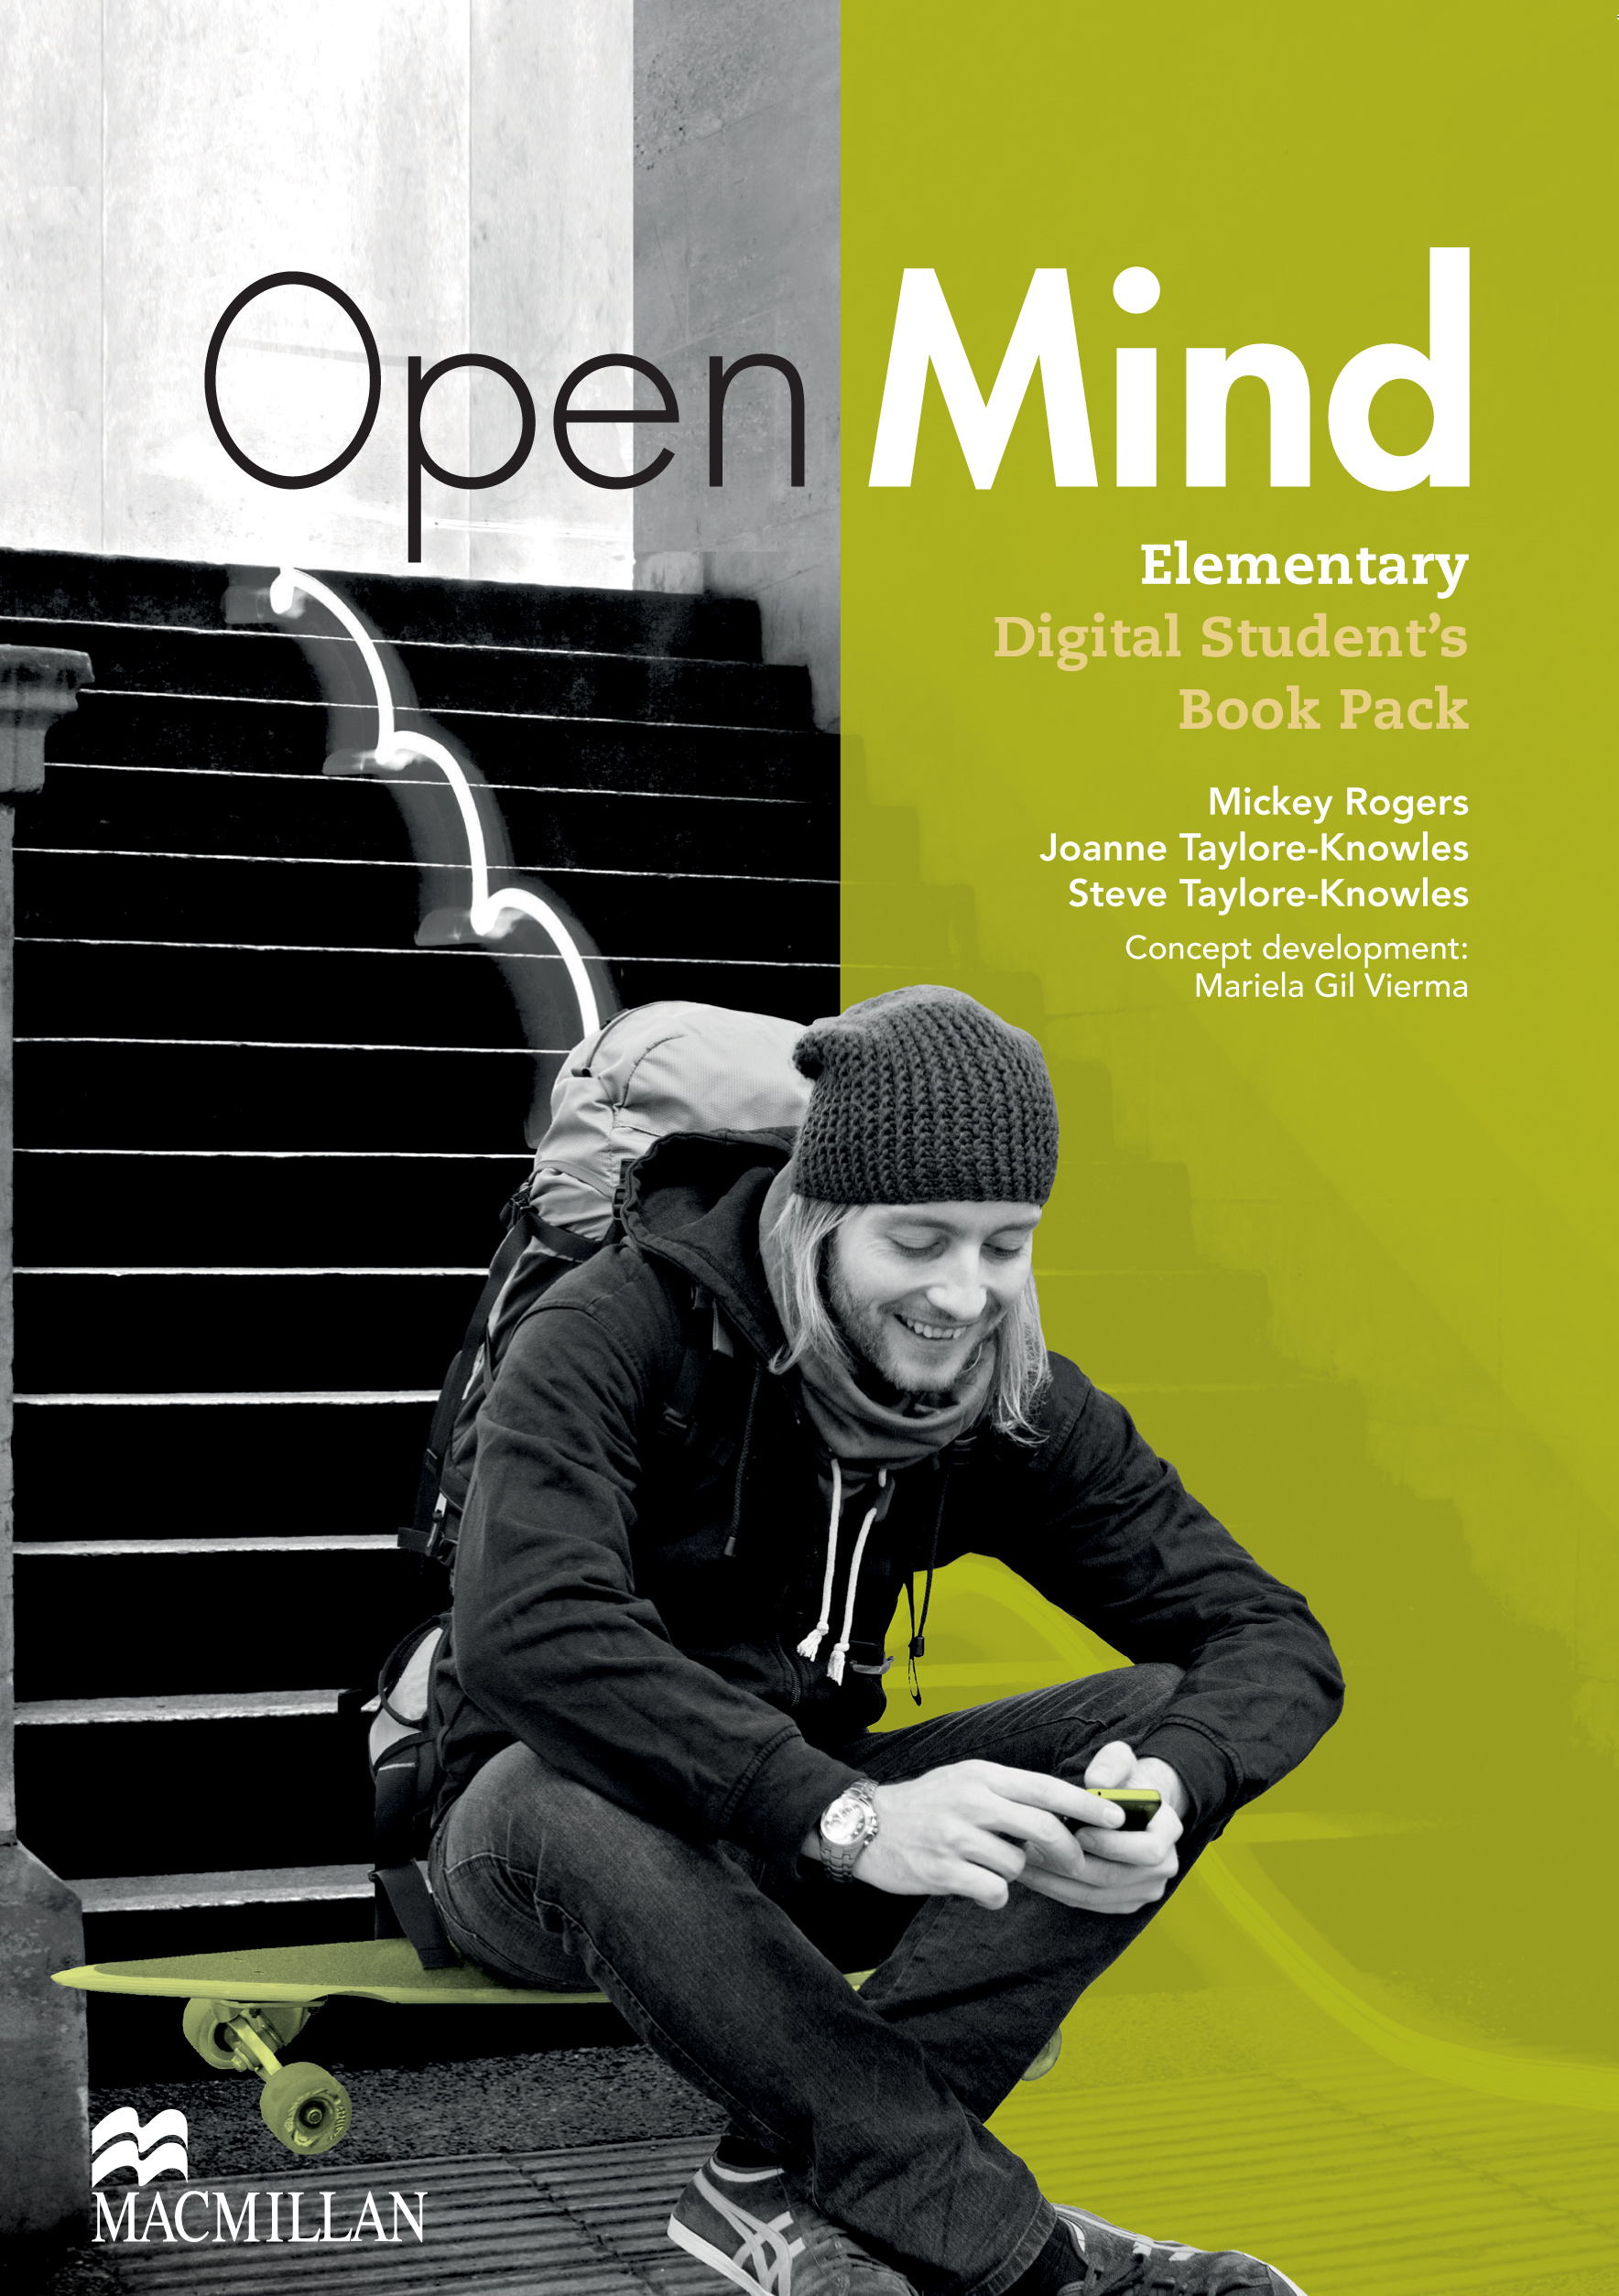 Open Mind Elementary Digital Student